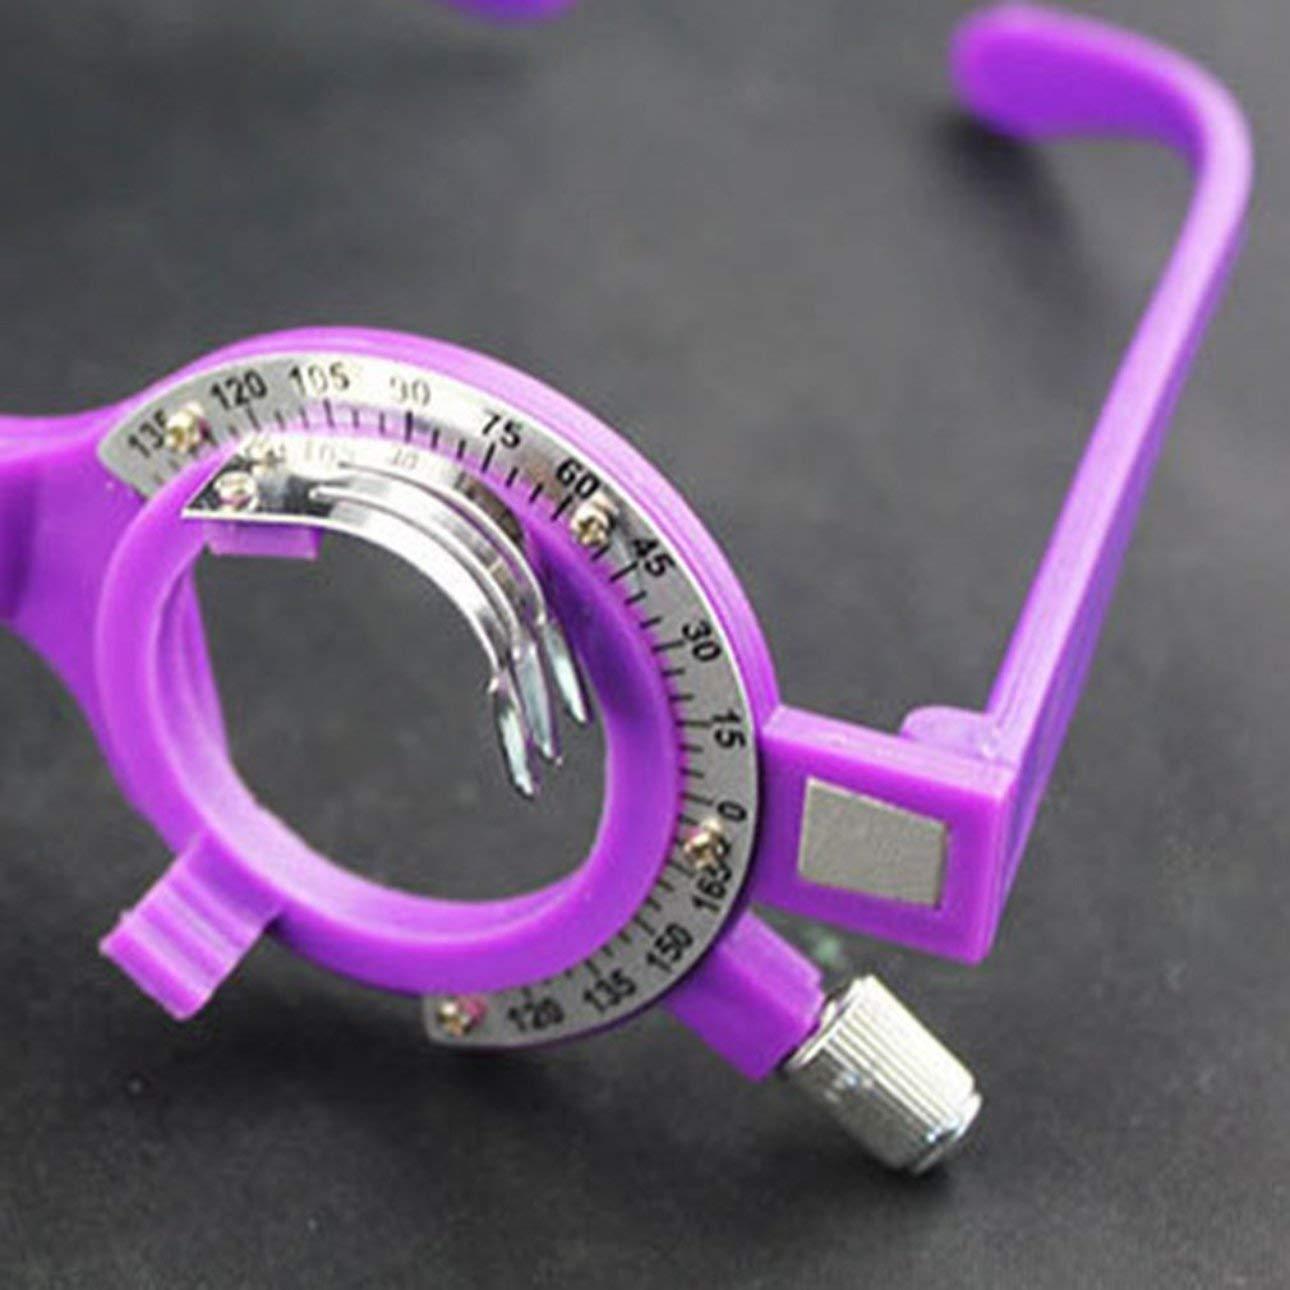 Liobaba Adjustable Optical Trial Lens Frame 52-70mm PD Eye Optometry Optician Plastic Eyeglasses Frame Eyeglasses Accessories